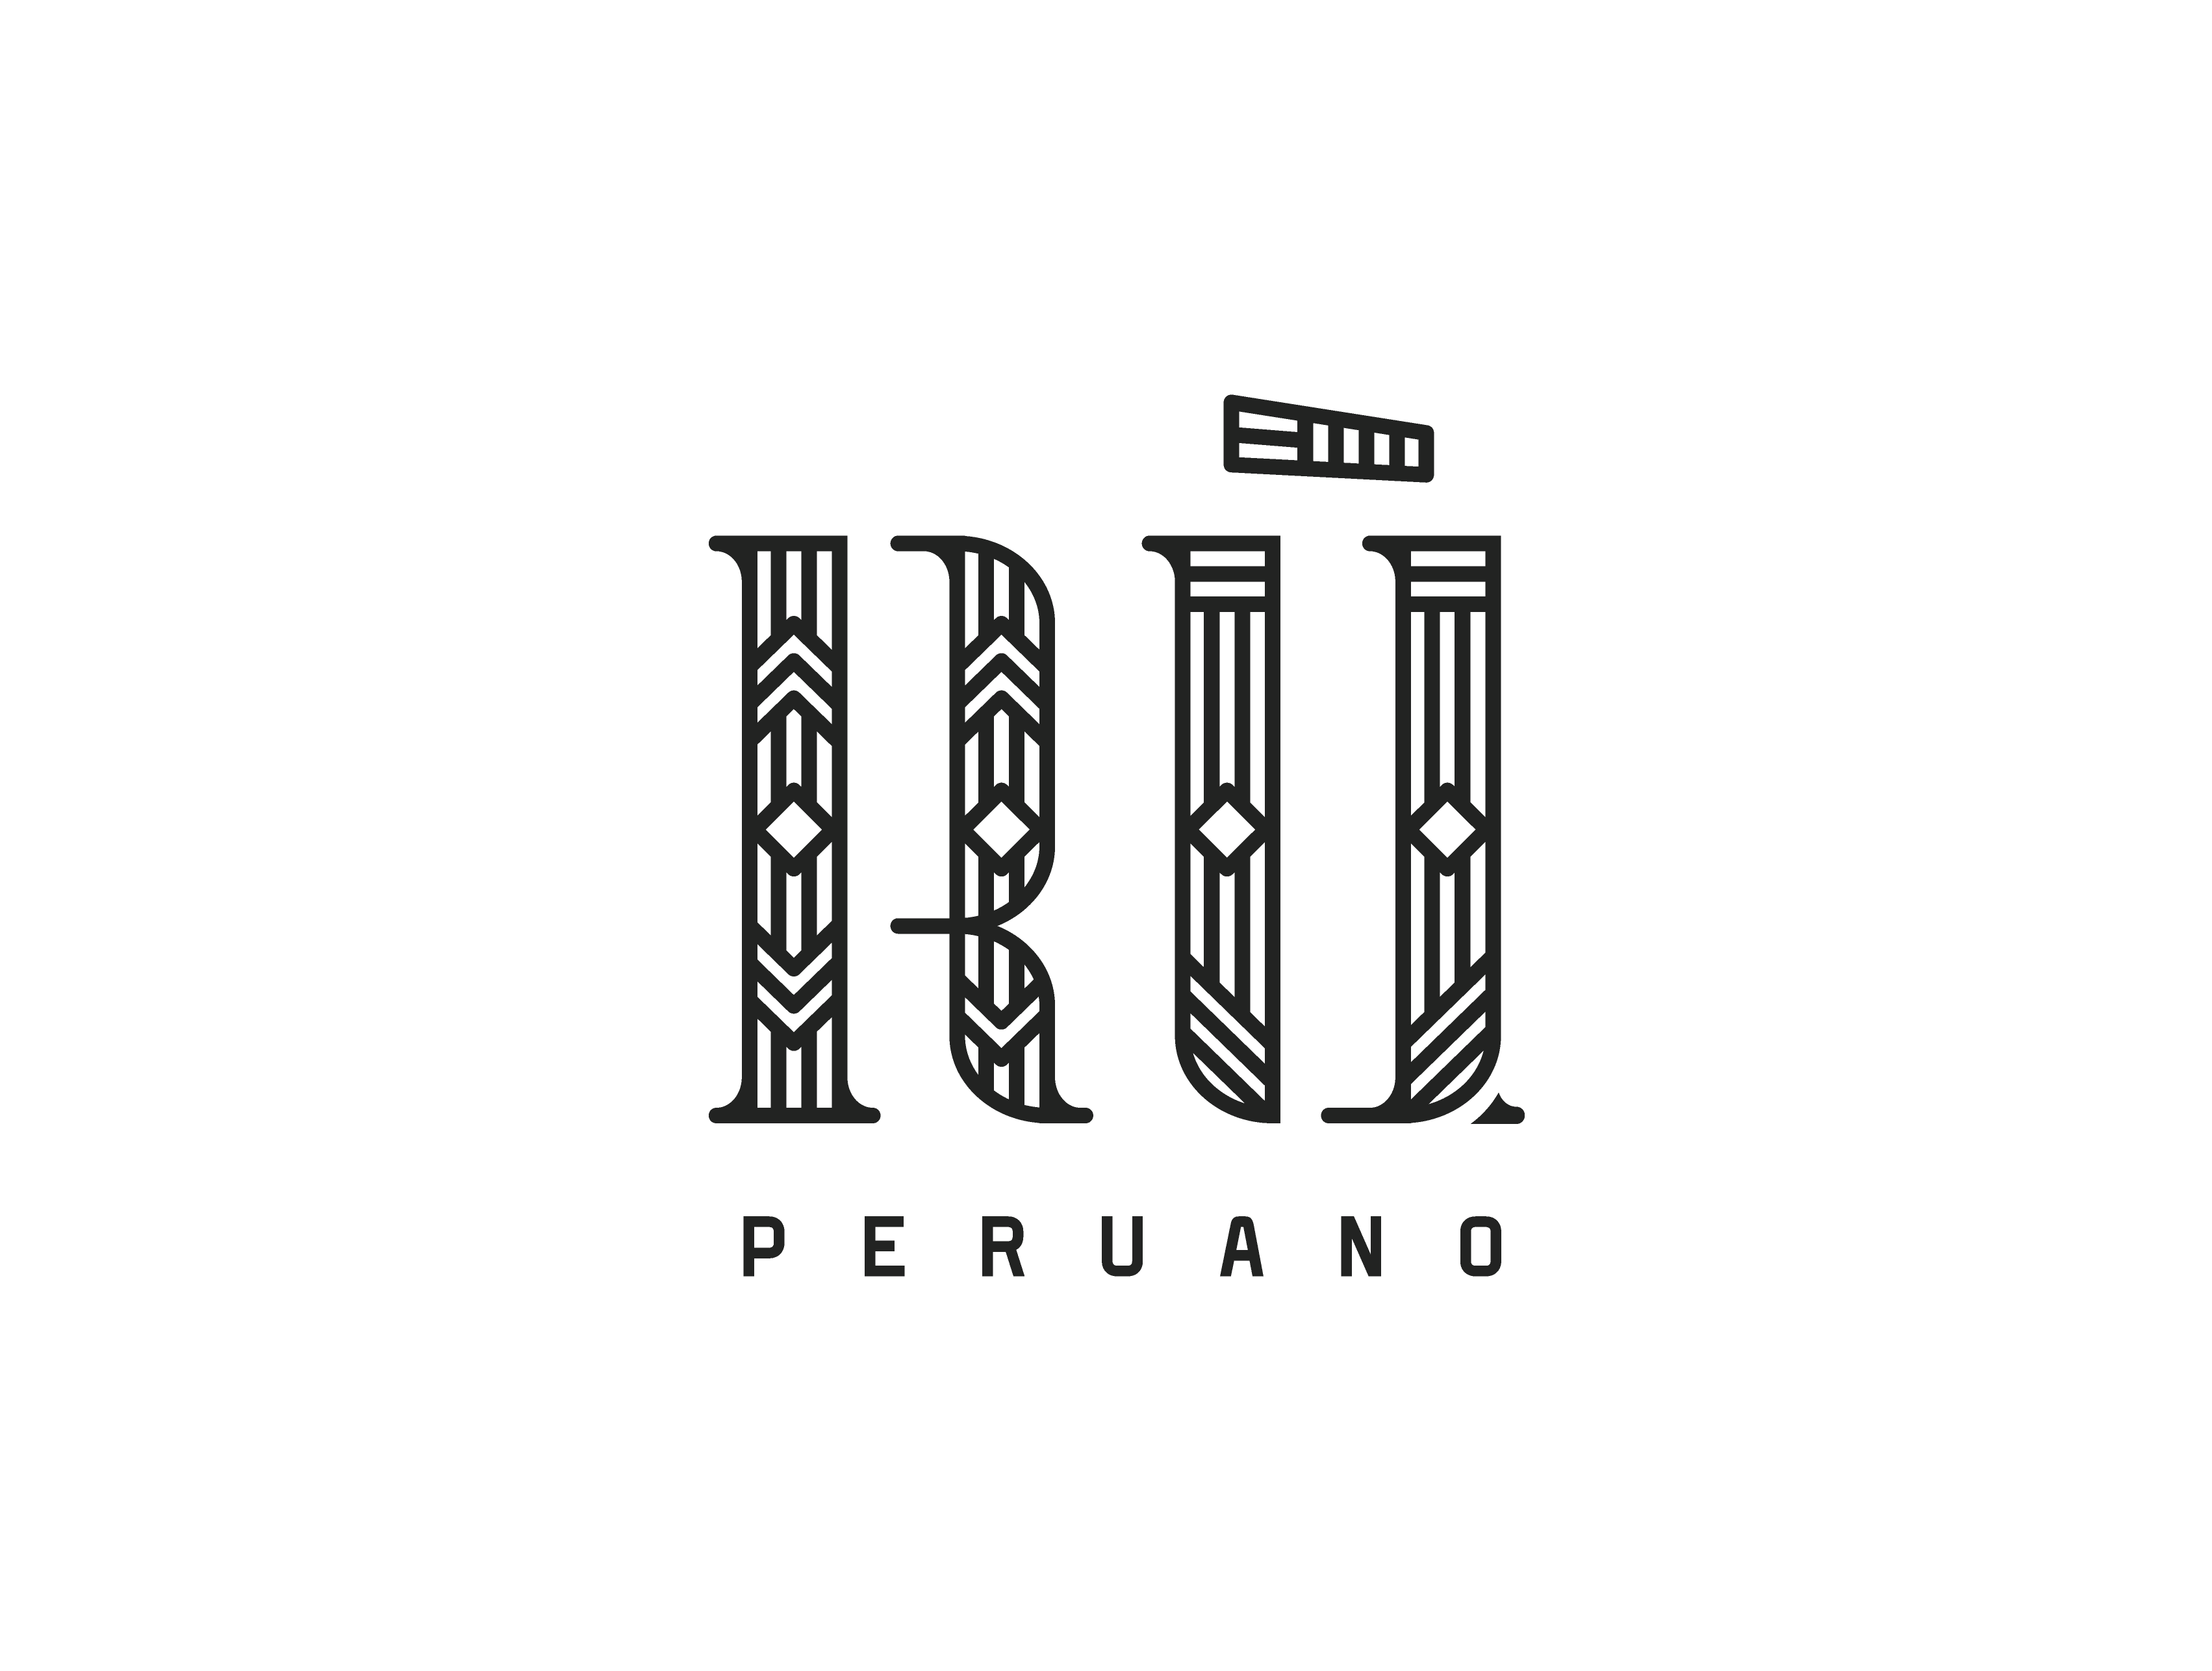 logo rù peruano